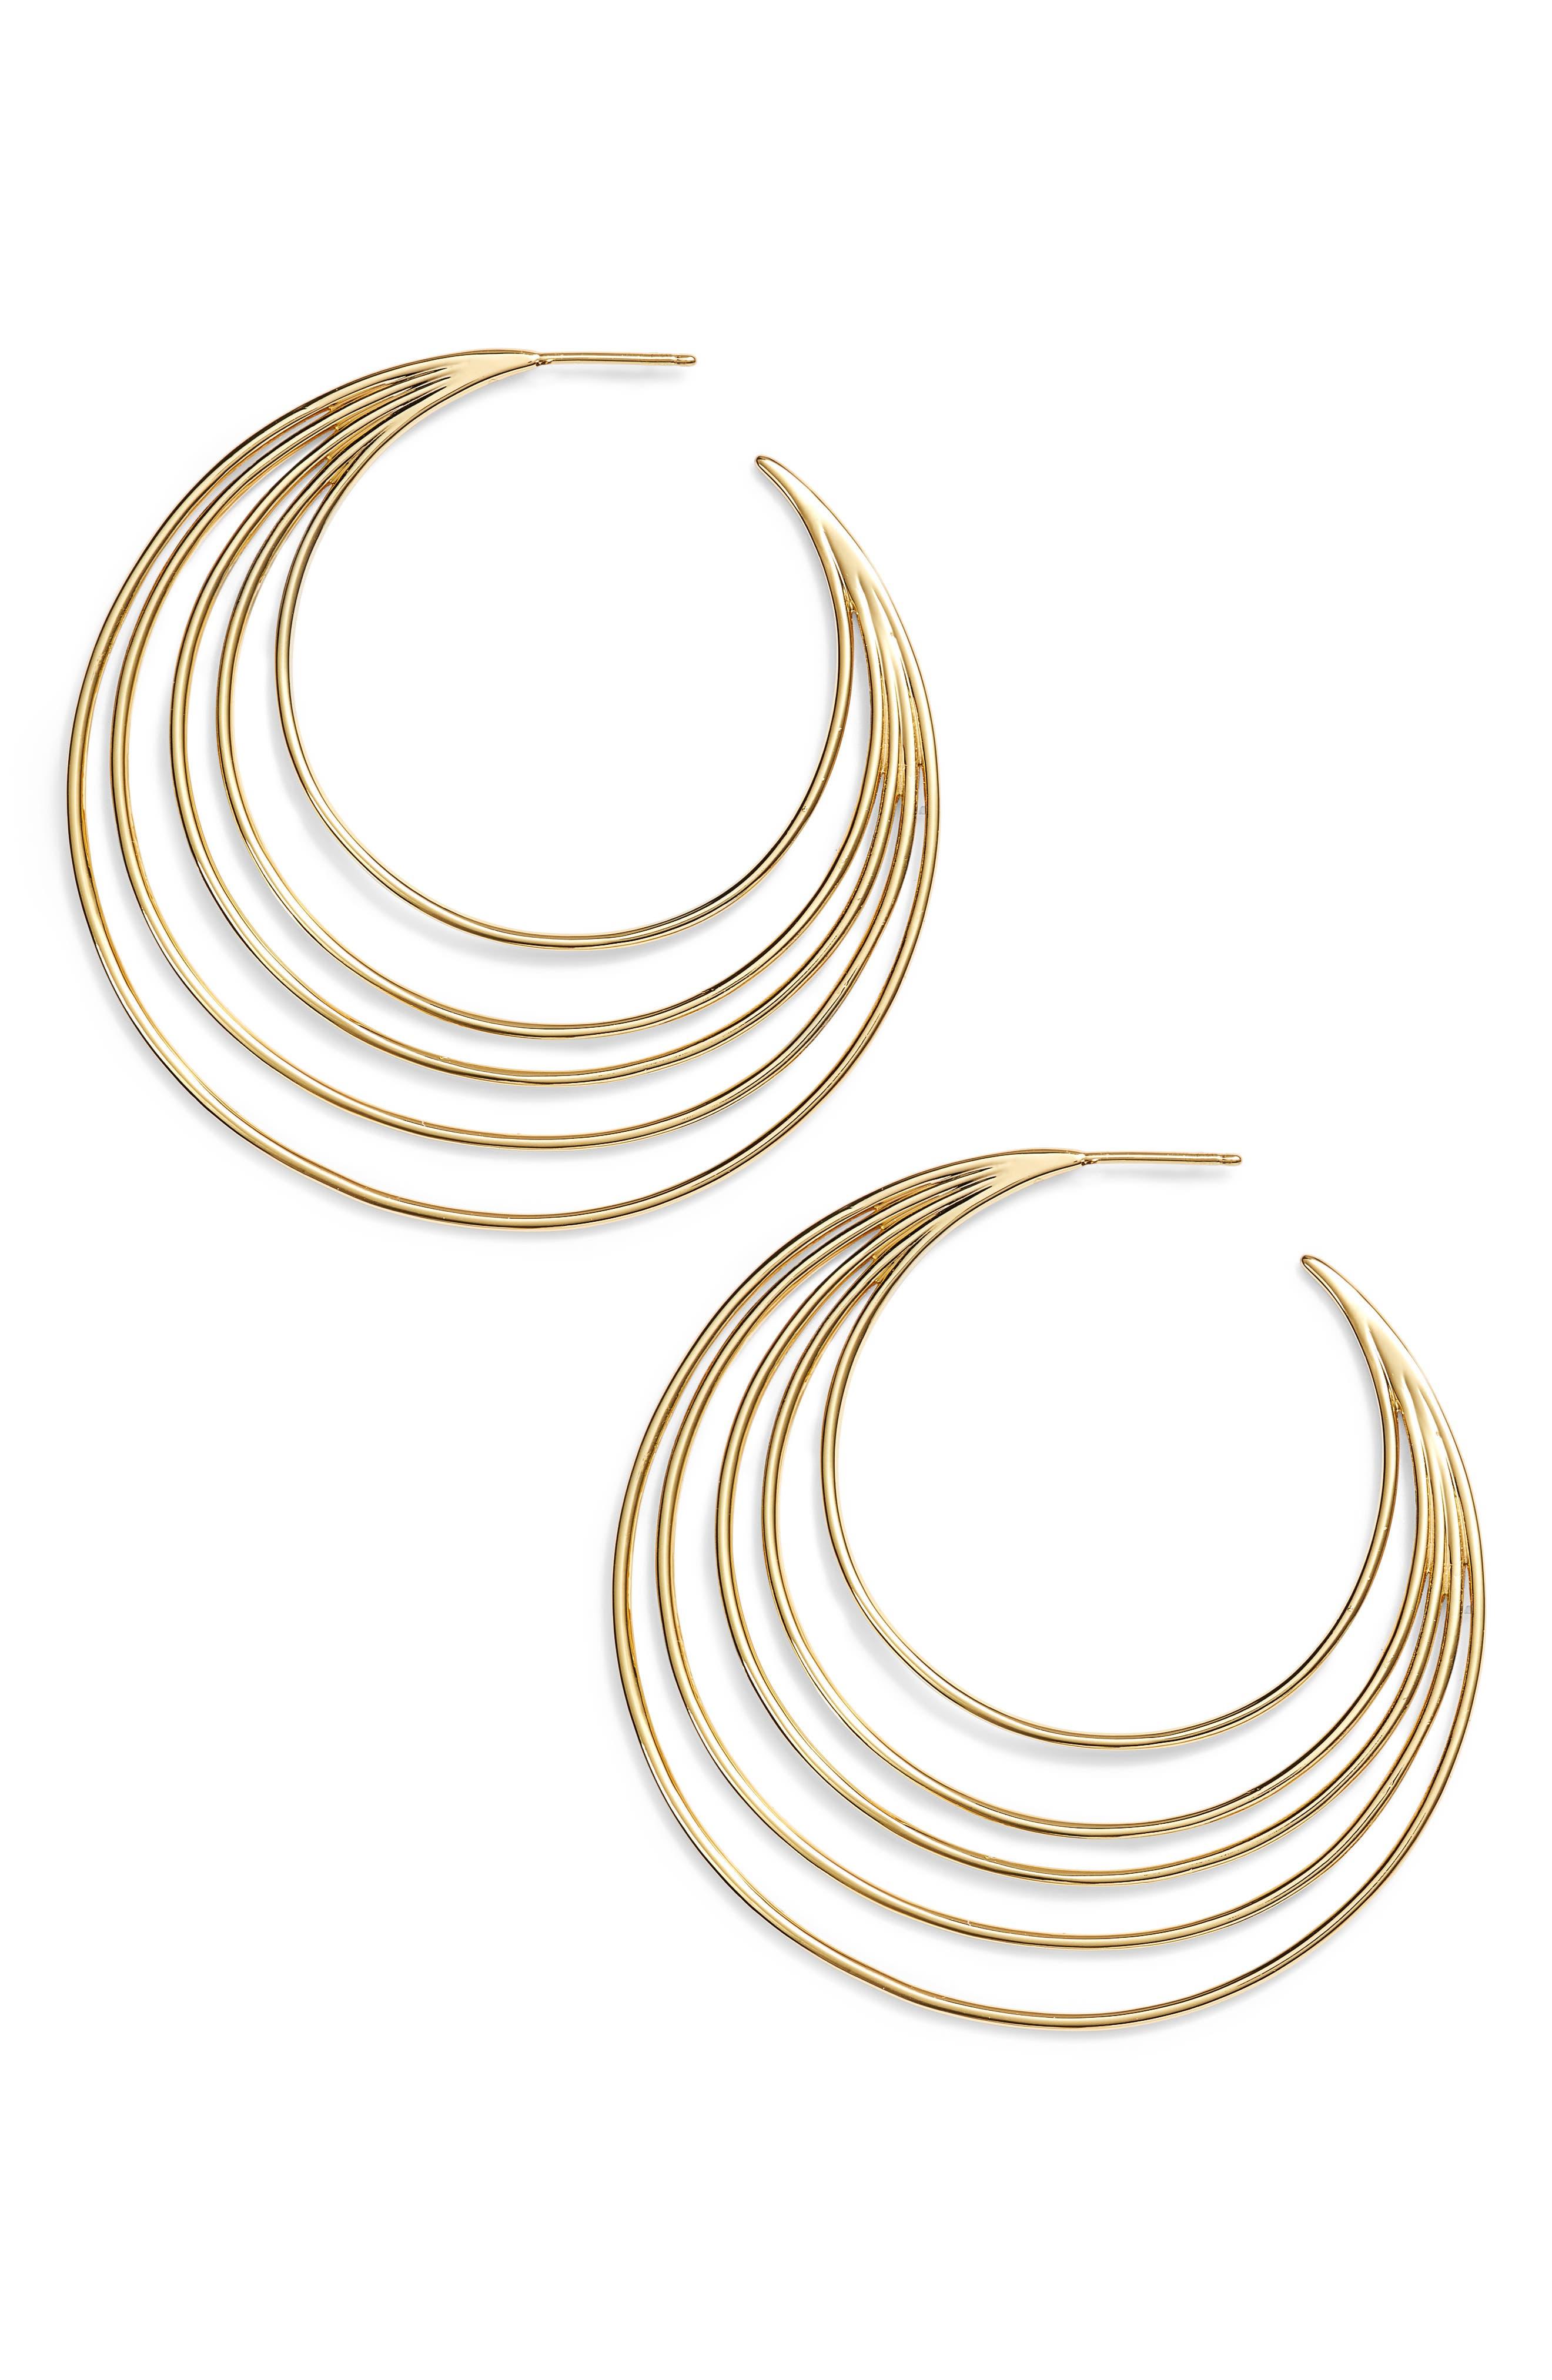 Casey Profile Hoop Earrings,                         Main,                         color, Gold